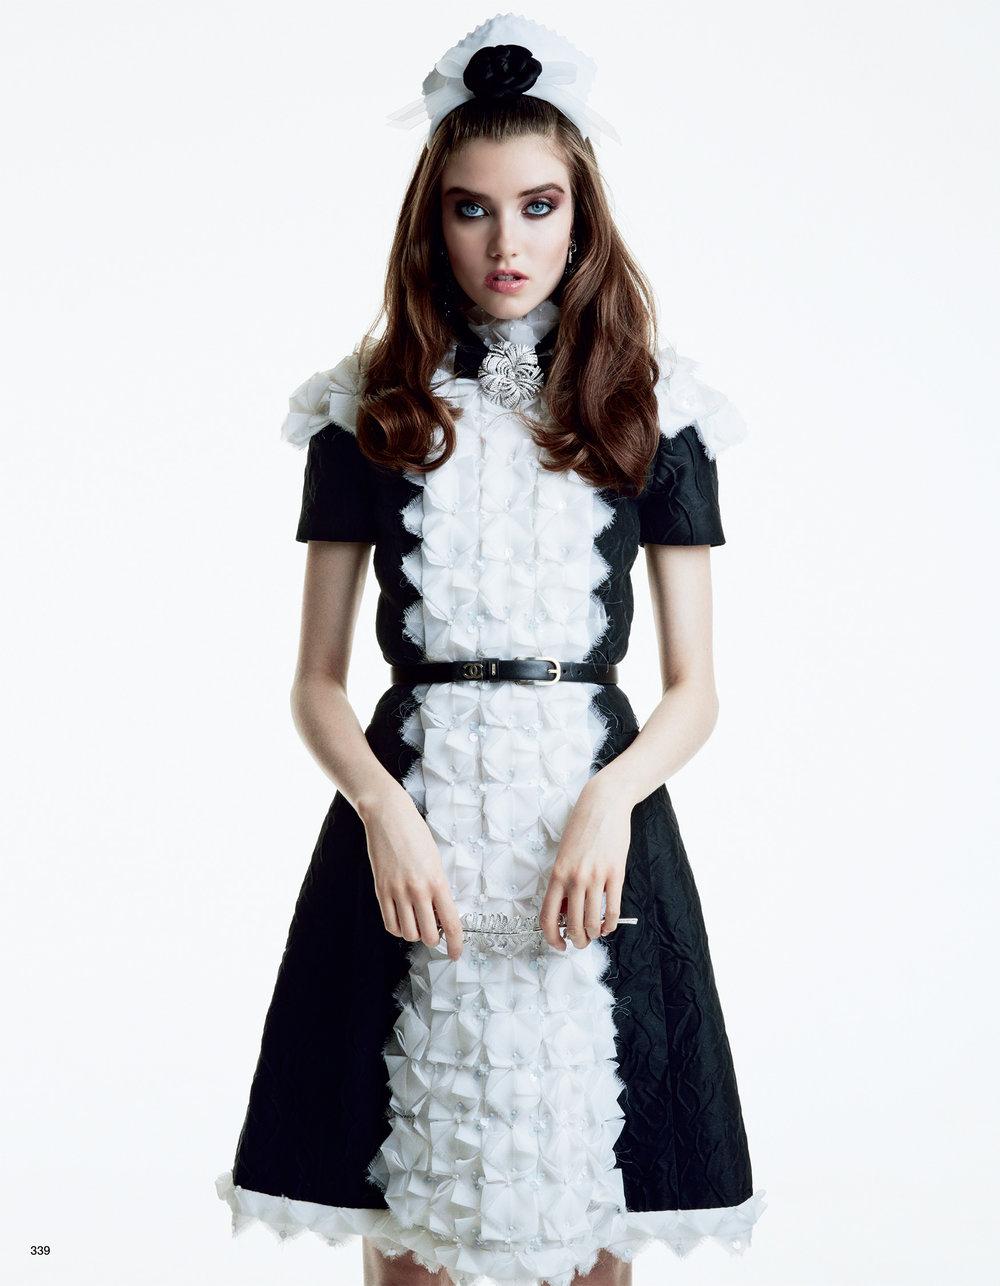 Giovanna-Battaglia-Vogue-Japan-October-2015-Patrick-Demarchelier-2.jpg